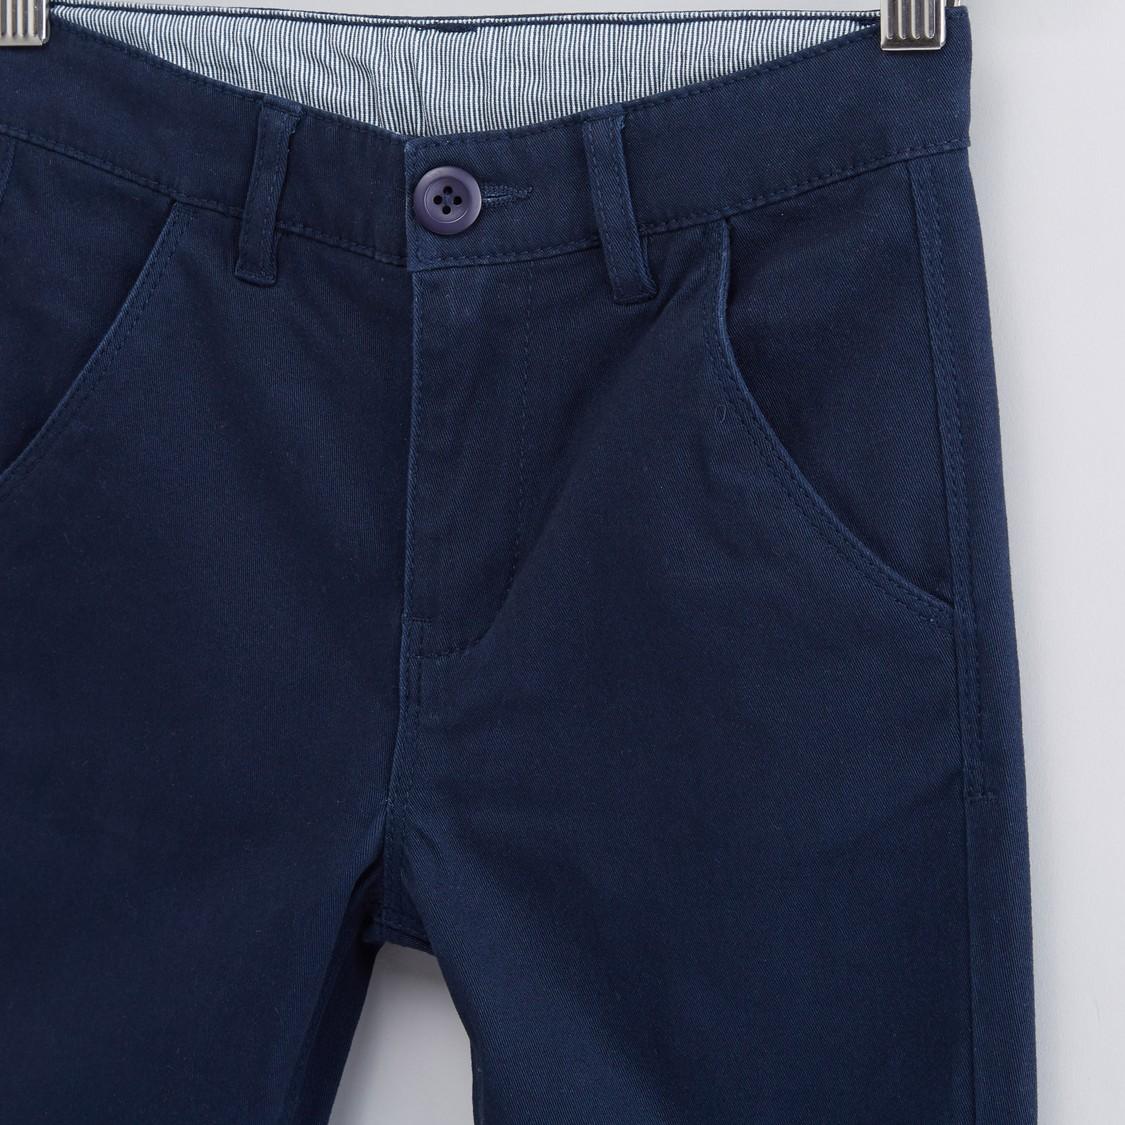 Pocket Detail Chinos